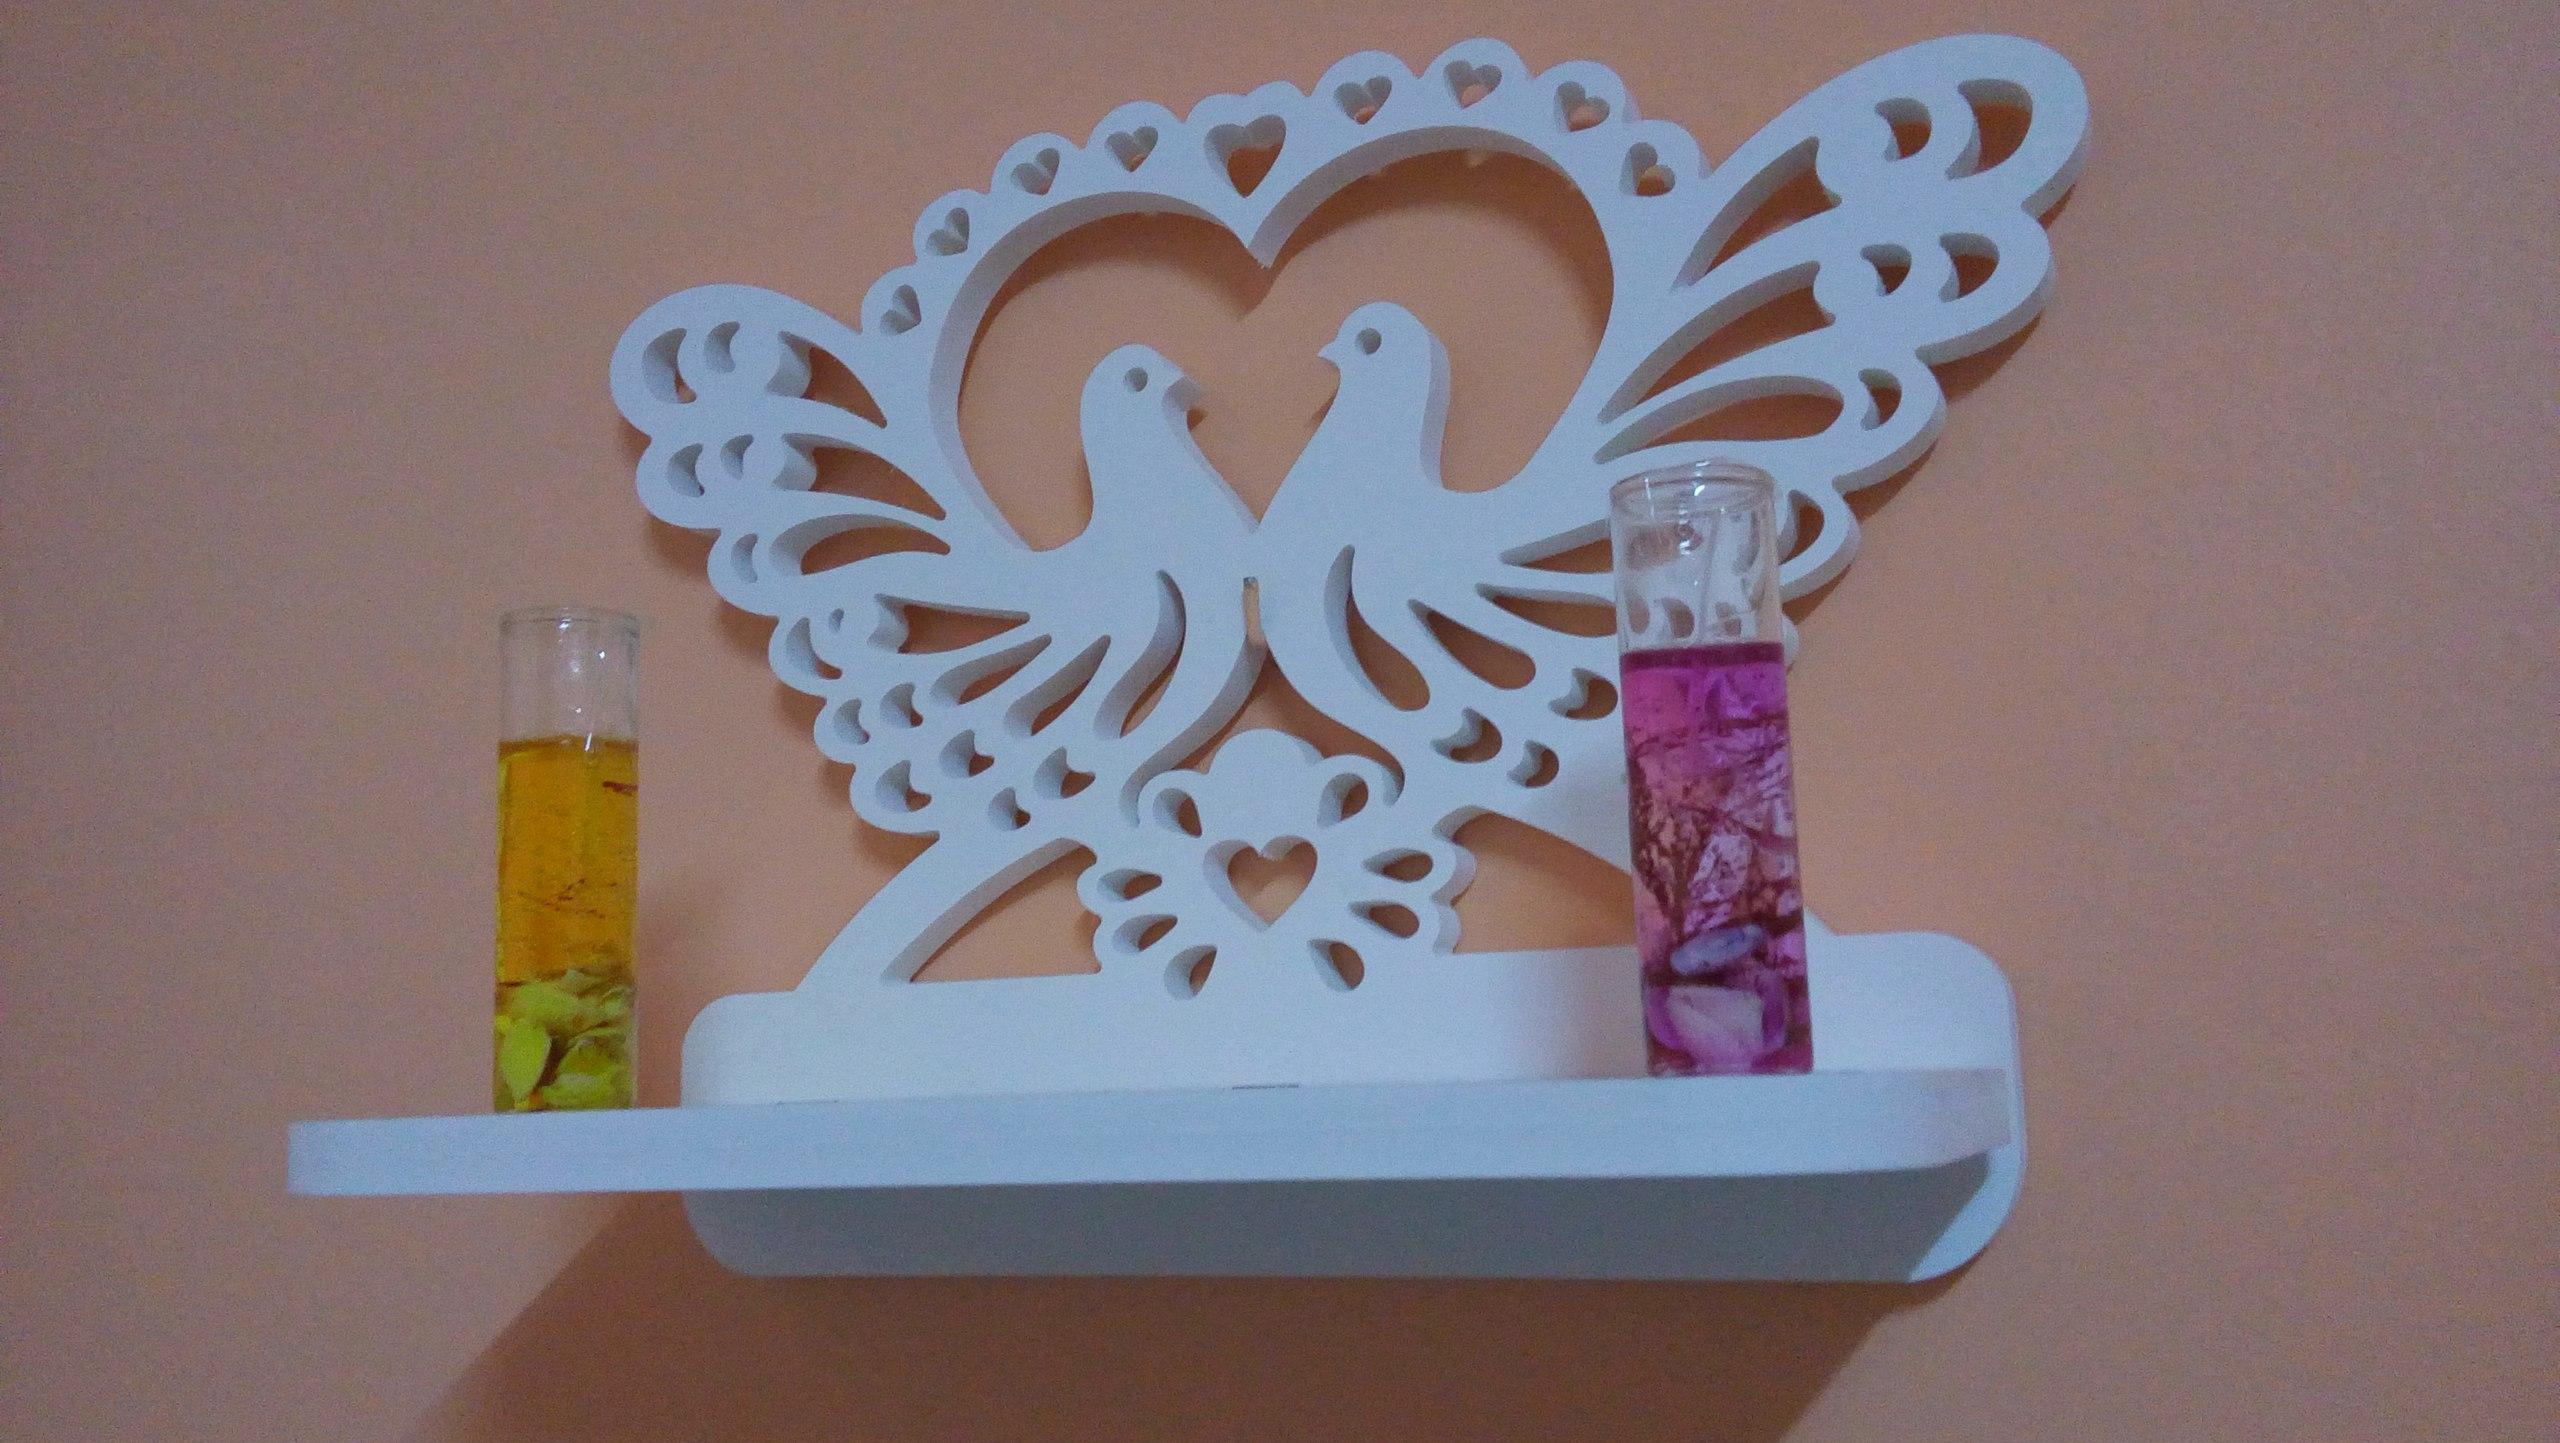 Decorative Bird Heart Shelf DXF File